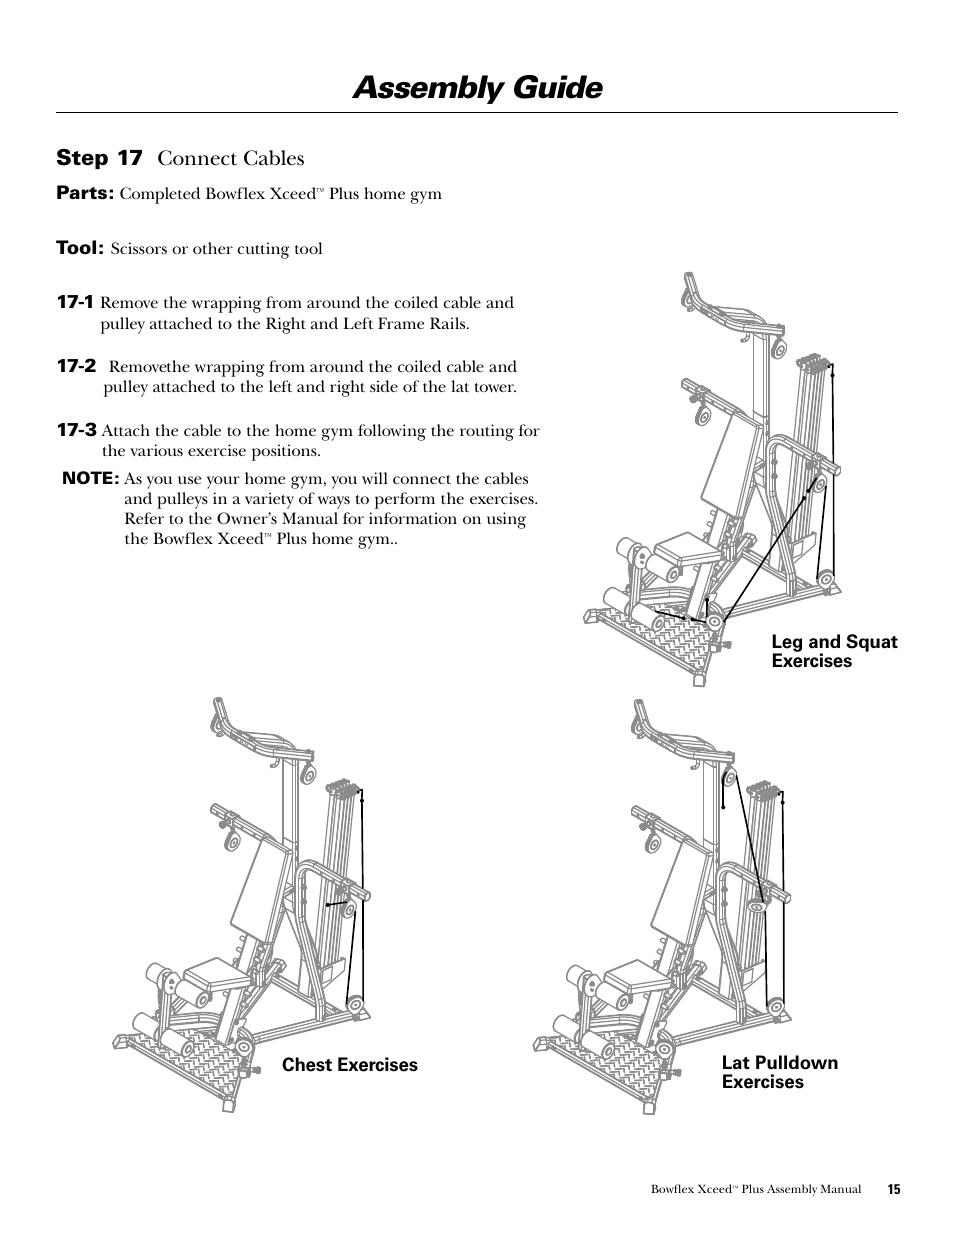 assembly guide step 17 connect cables bowflex xceed plus user rh manualsdir com Bowflex XTL Manual PDF Bowflex XTL Manual PDF